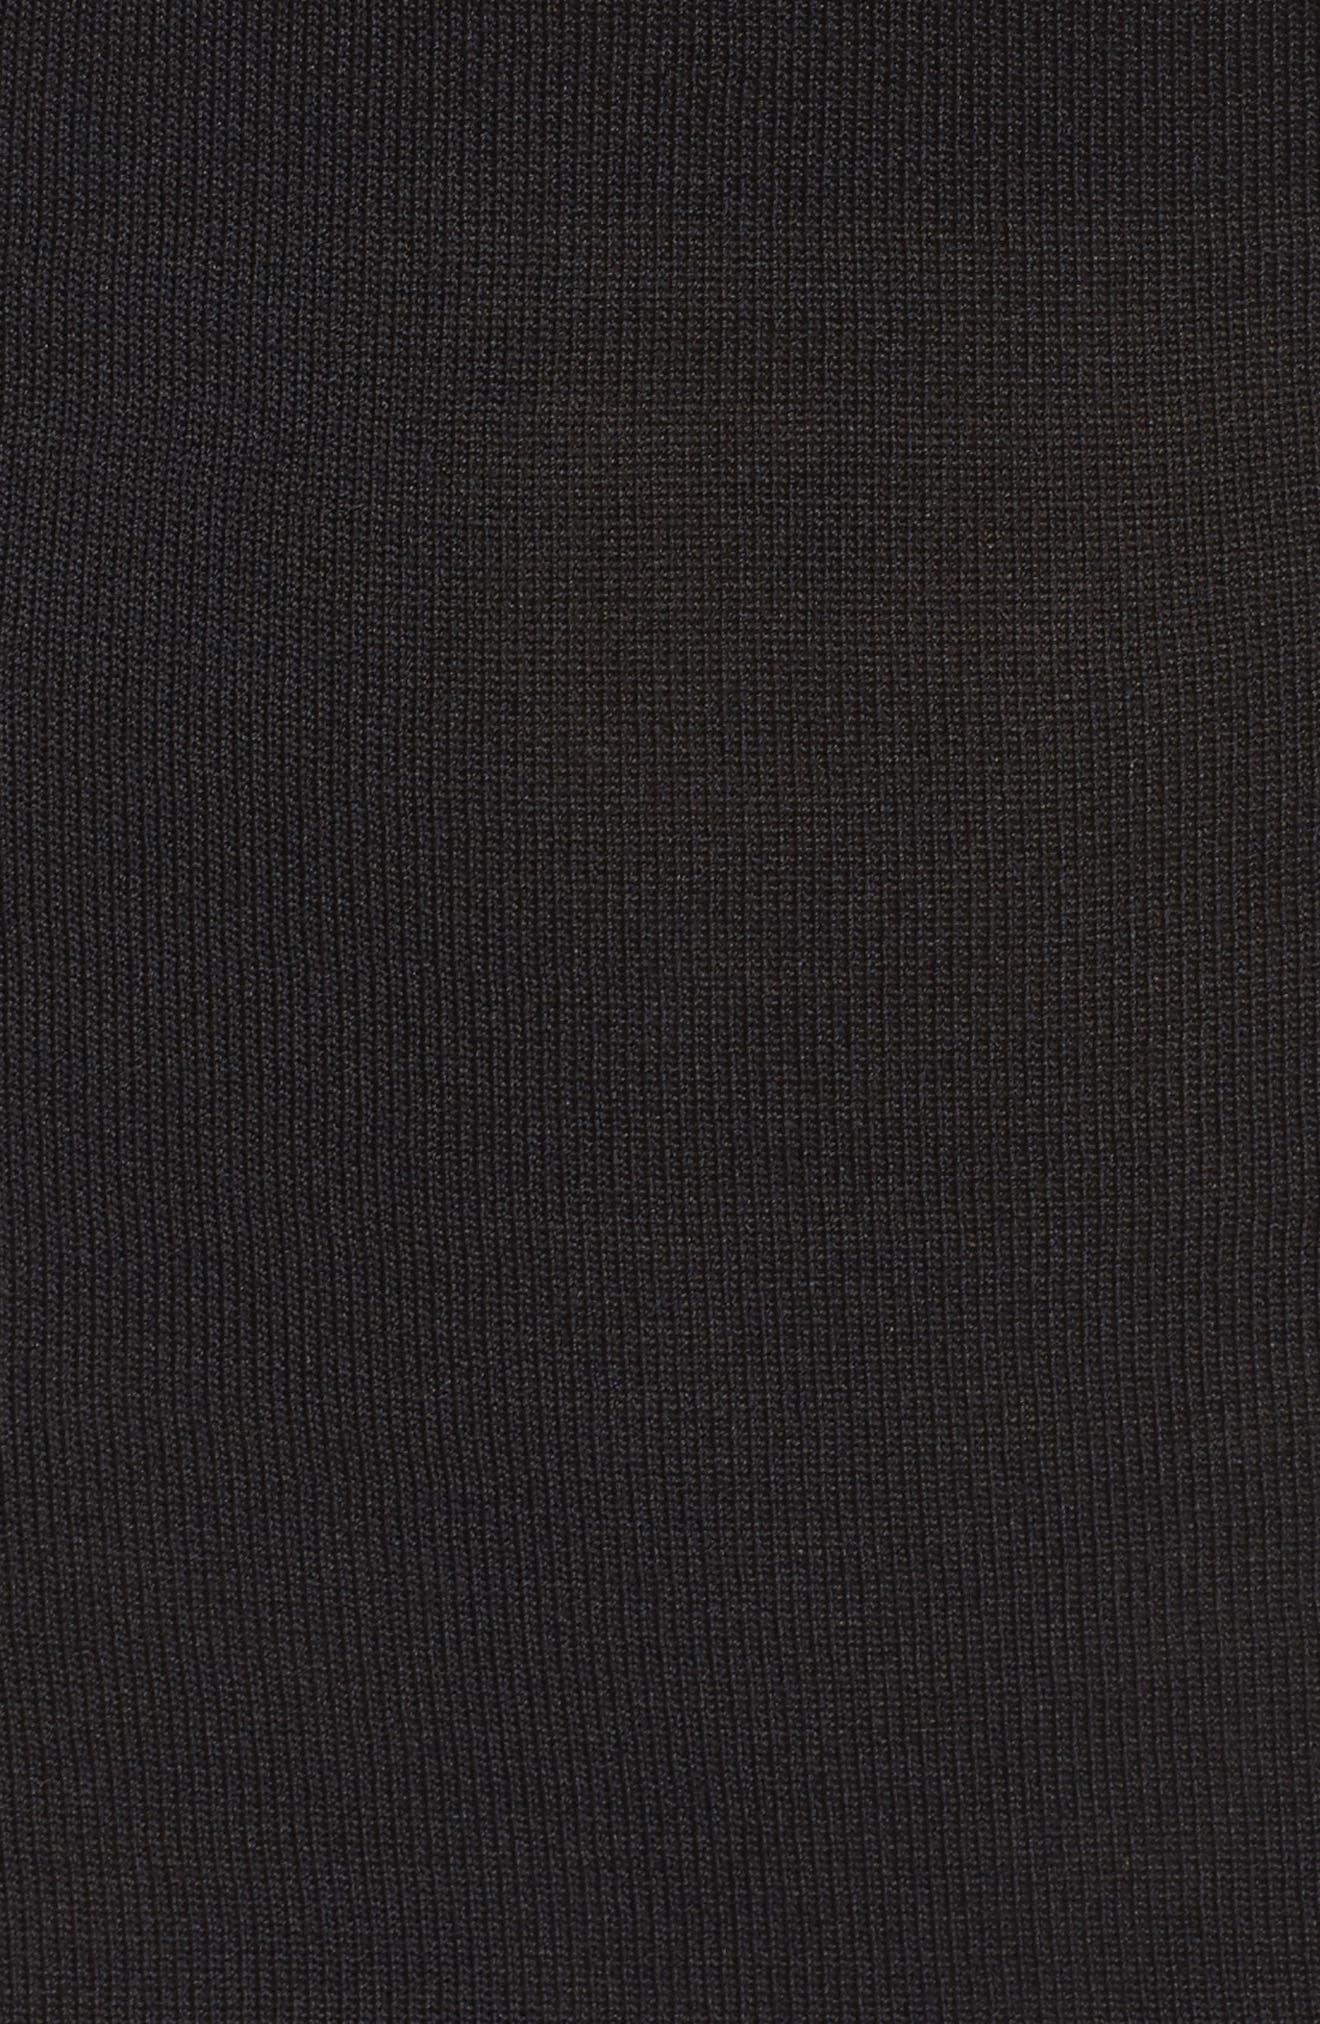 Hard Lemonade Knit Dress,                             Alternate thumbnail 6, color,                             001